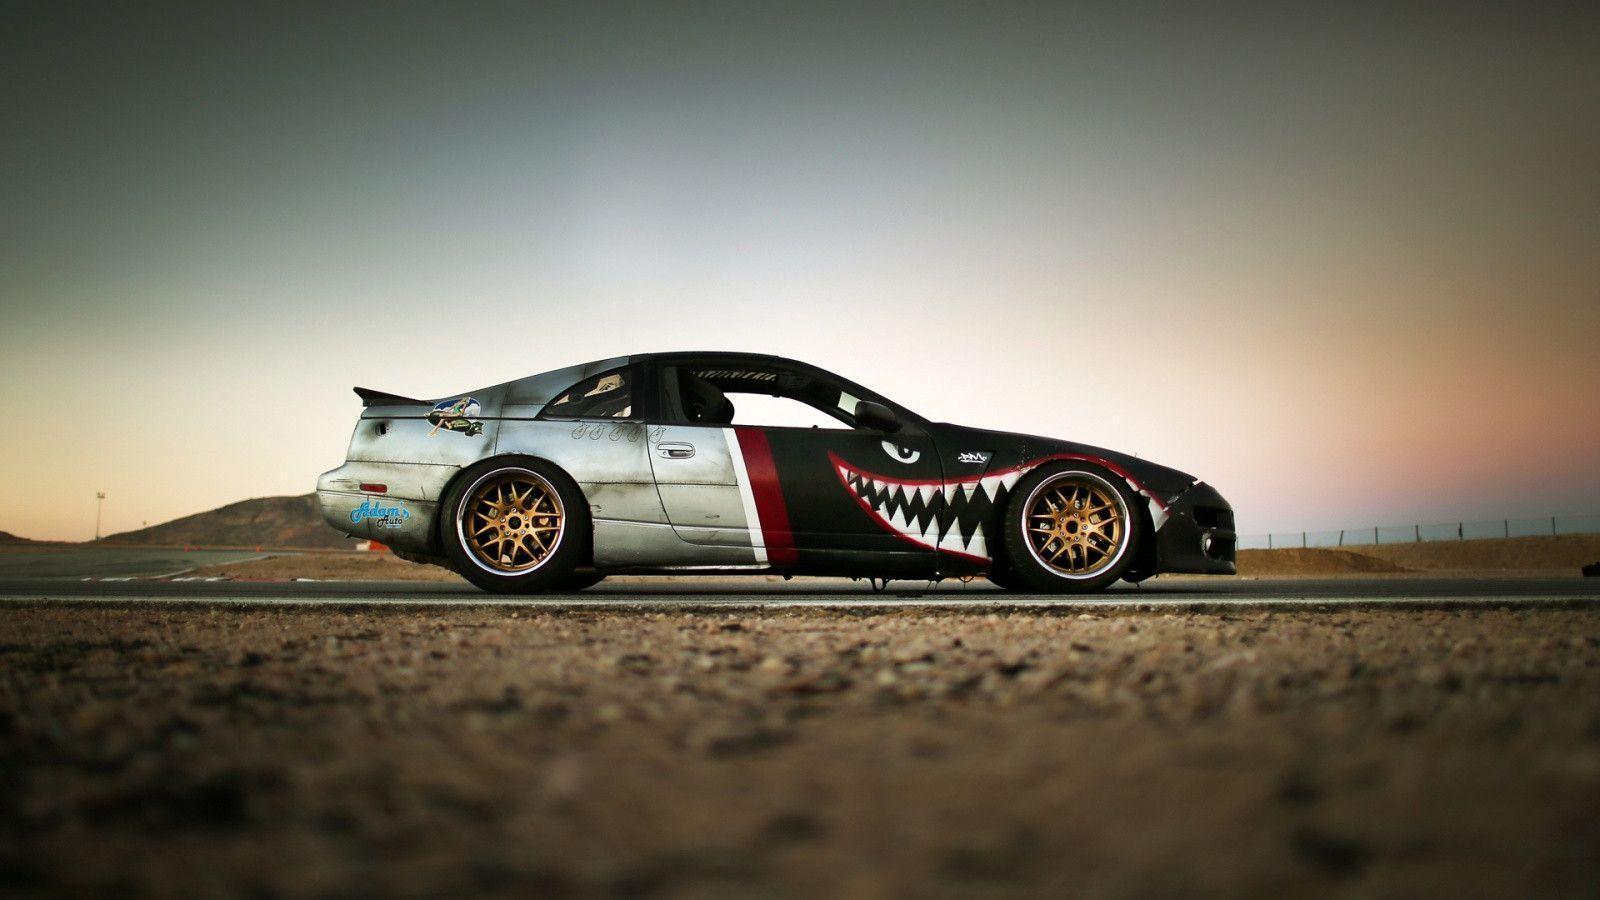 240sx Fairlady >> Z32 Drift Car | newhairstylesformen2014.com